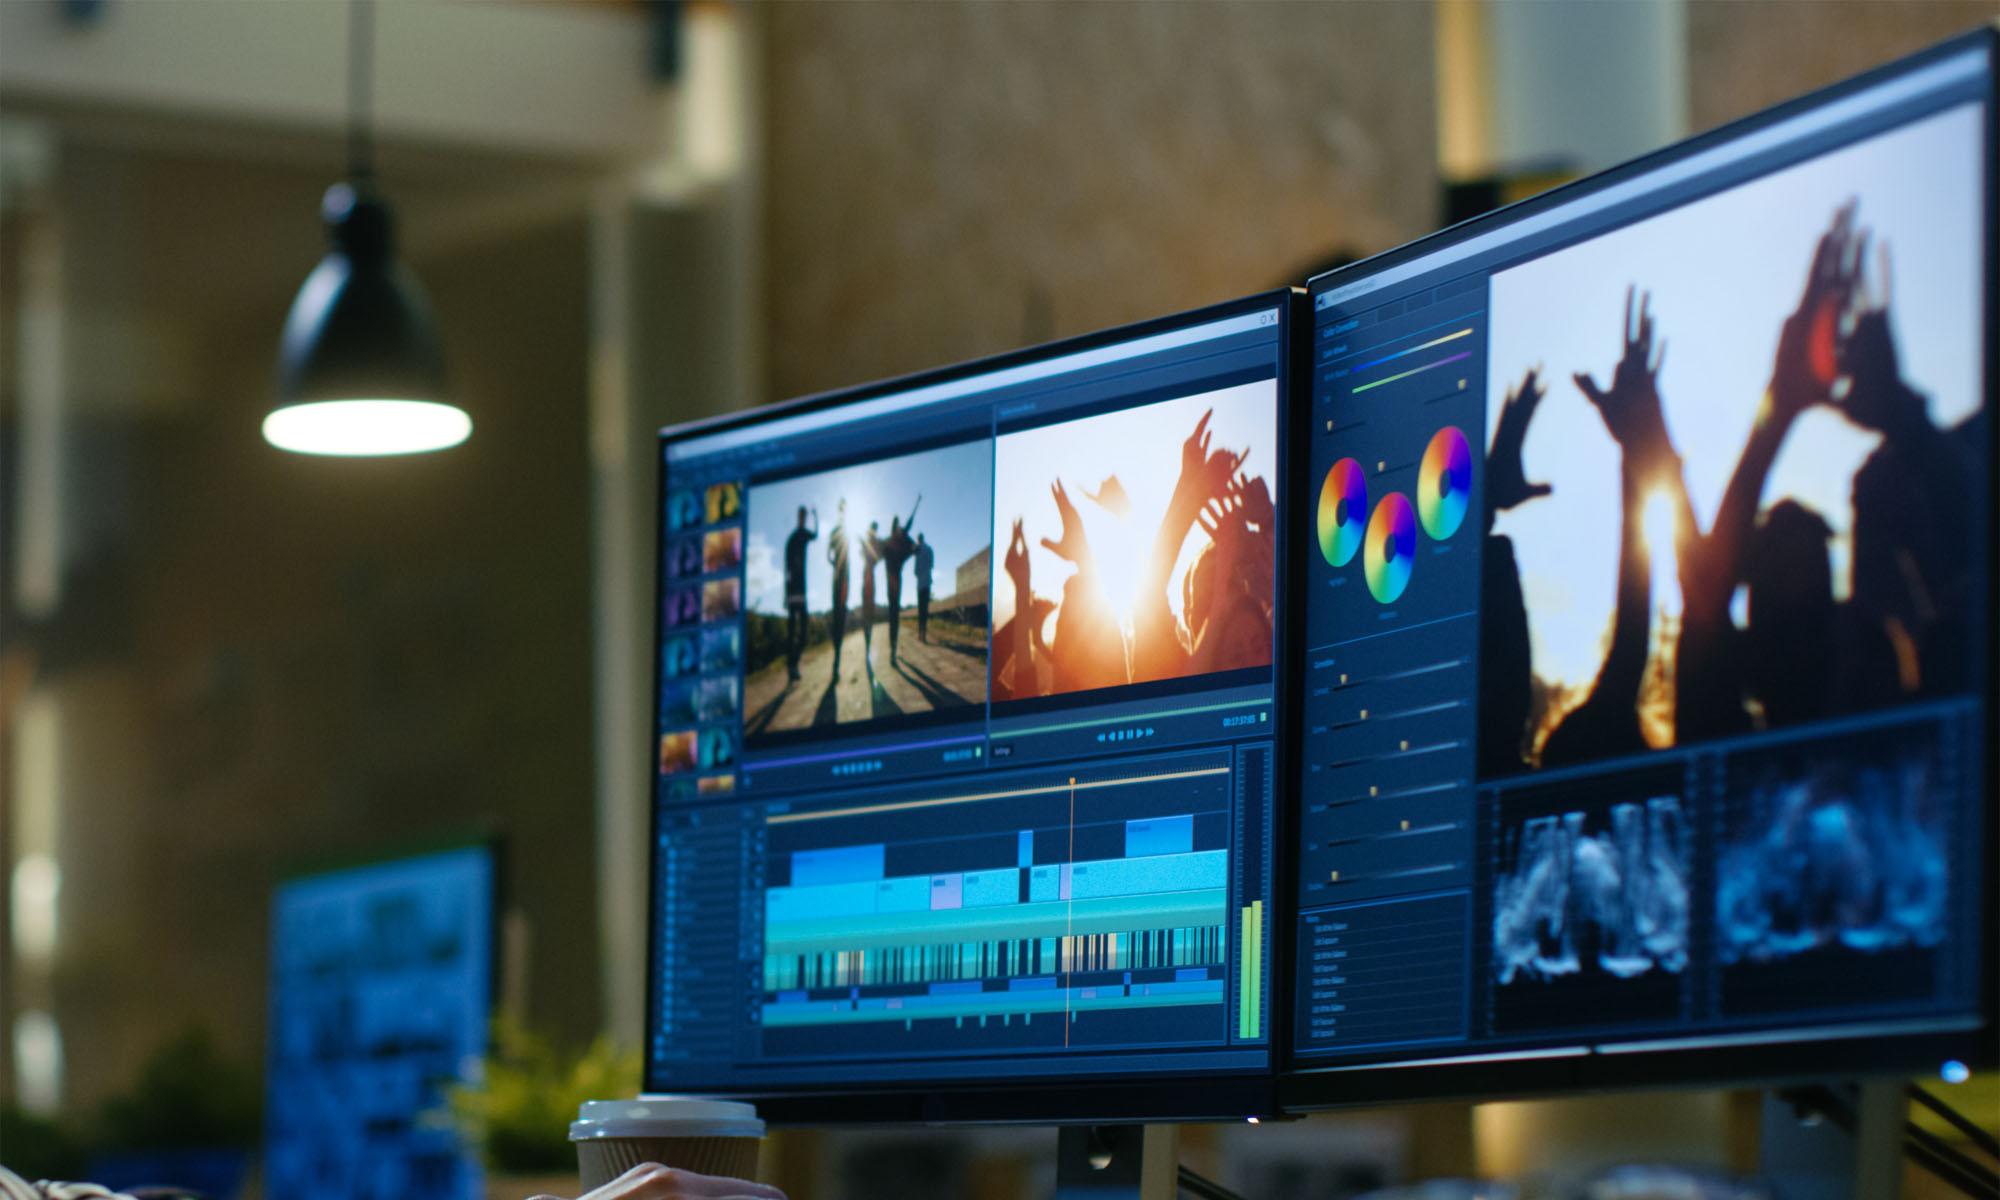 Imagefilm | Filmmusik | Videoproduktion / Filmproduktion in Kiel